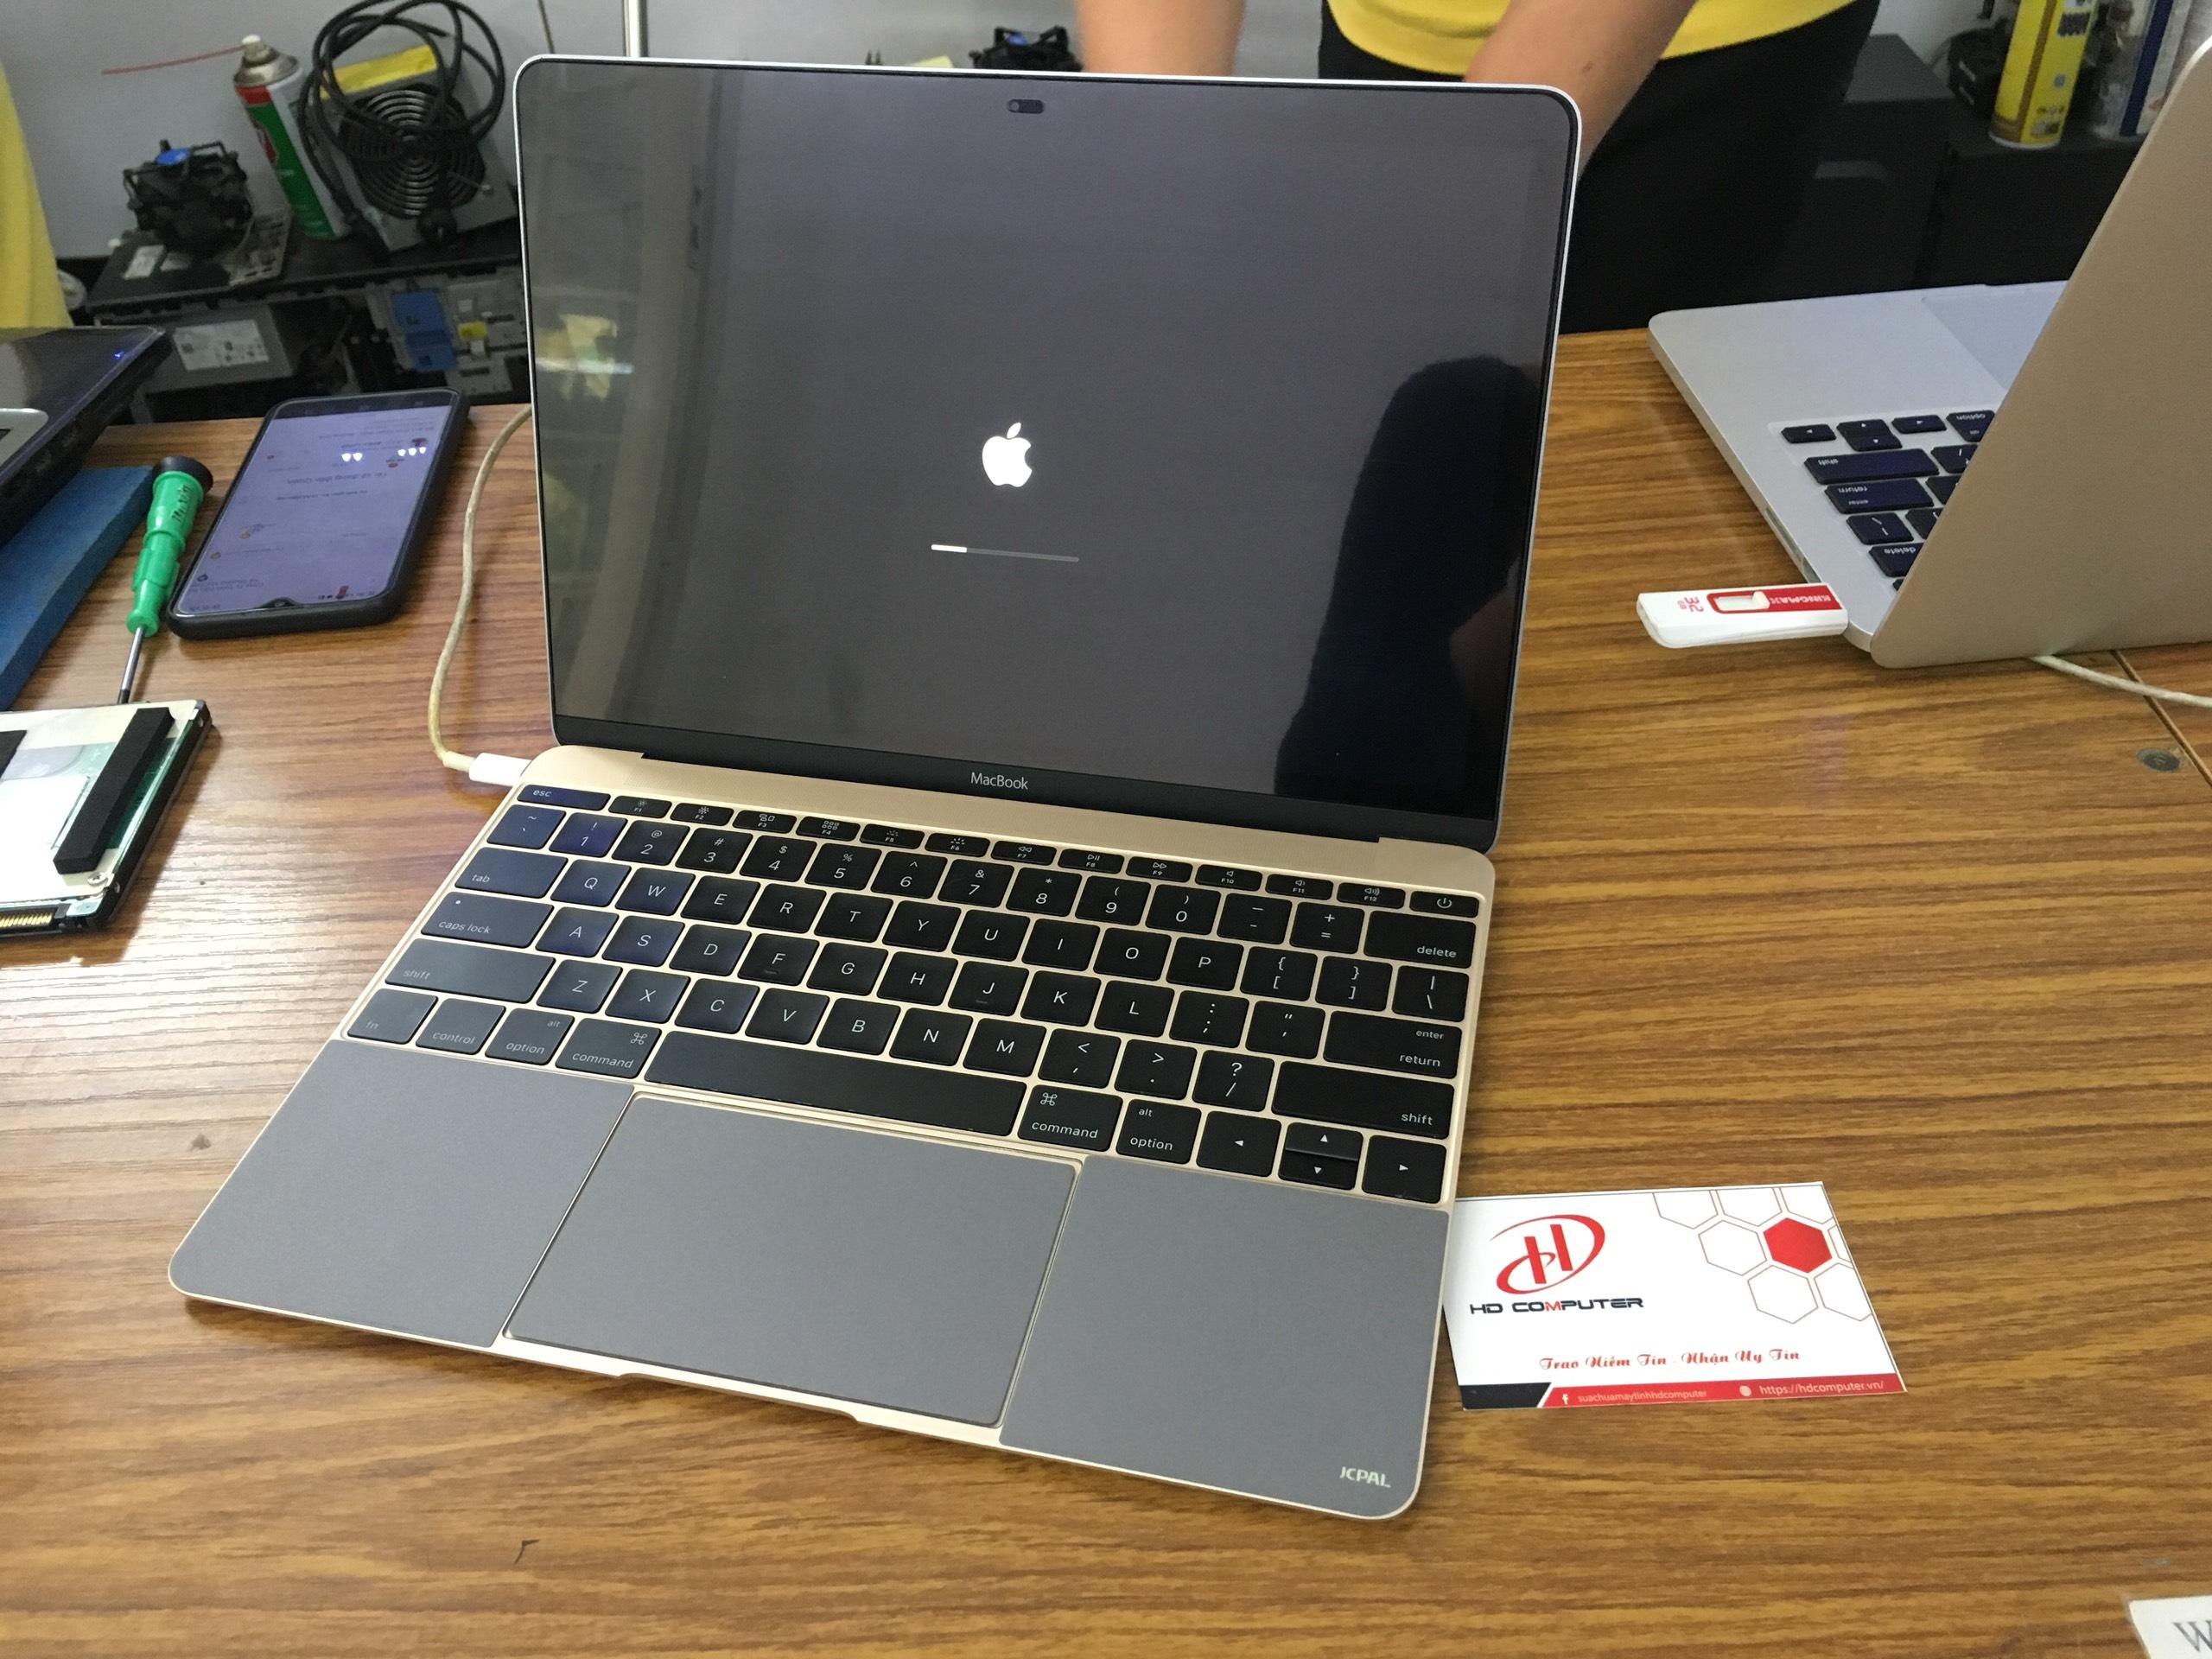 Test macbook trước khi mua